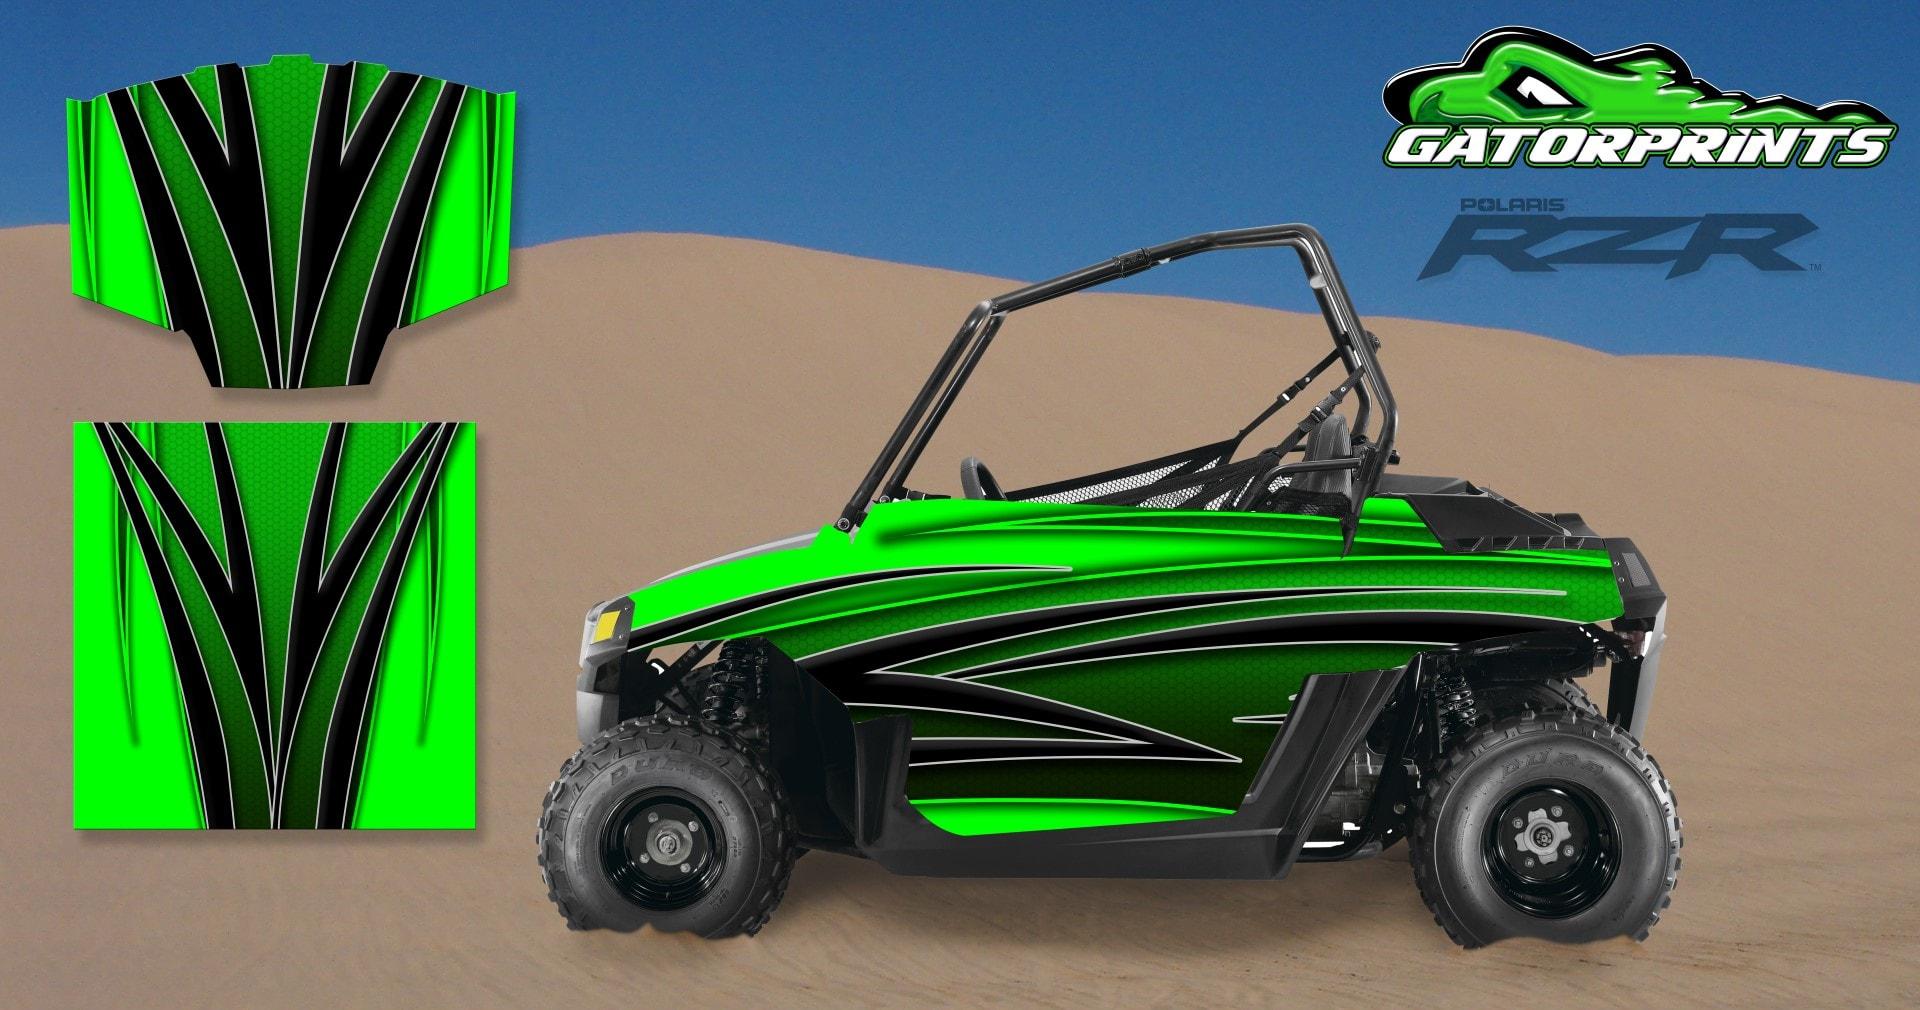 RZR Custom Decal Kits Polaris Graphics - Decal works graphicsdecal works camo graphics youtube